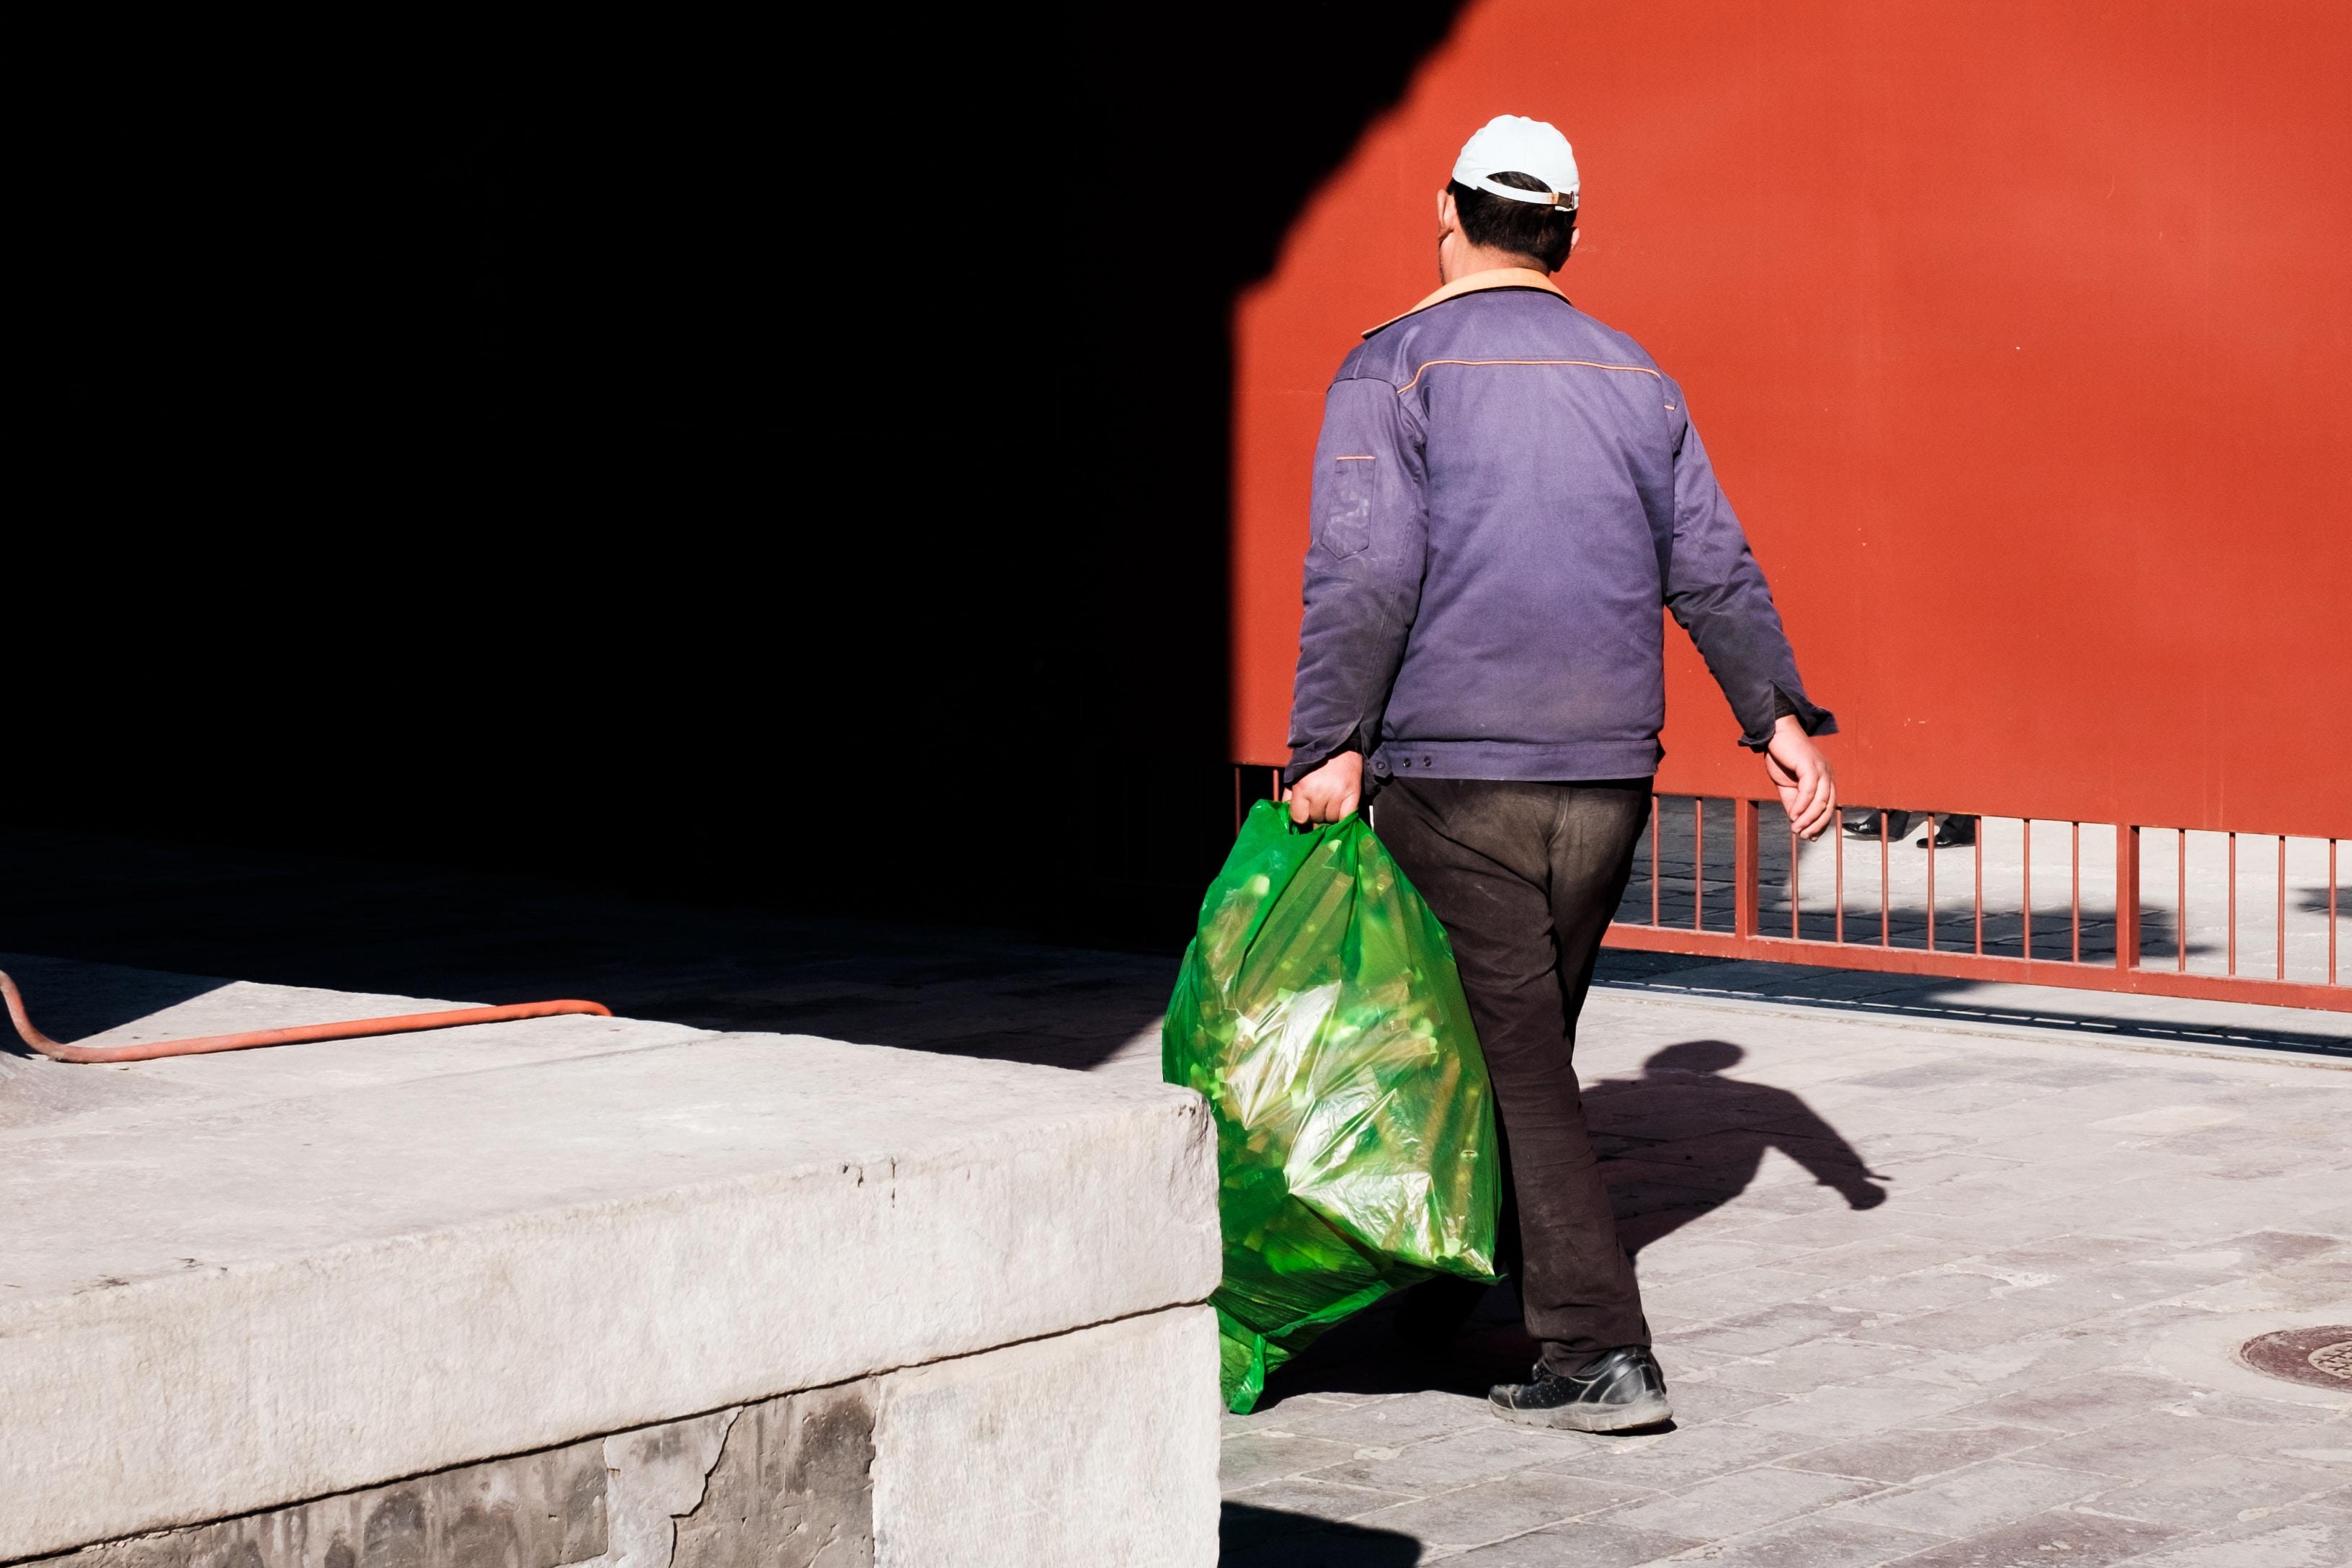 man carrying green plastic bag